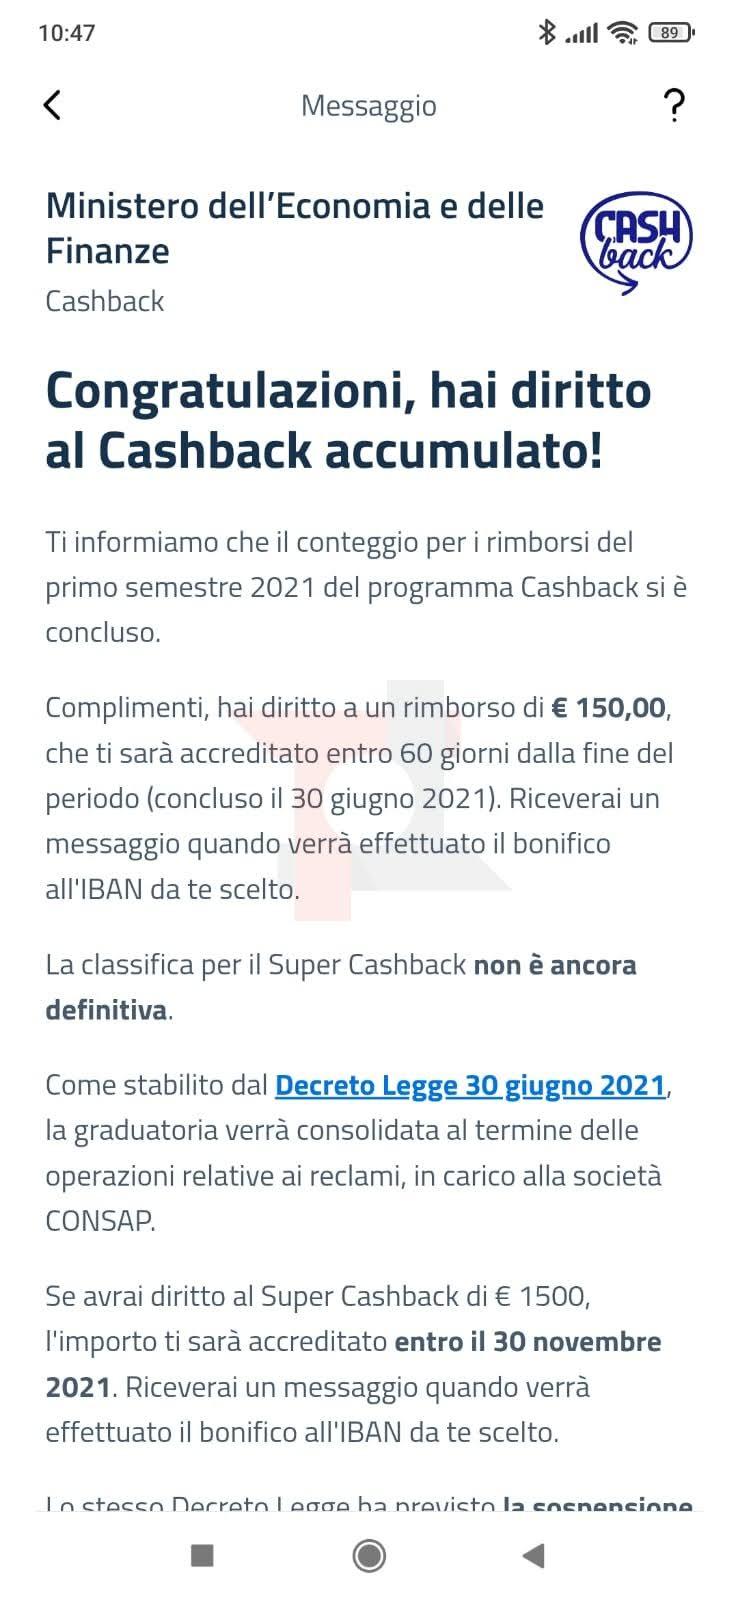 cashback di stato rimborsi